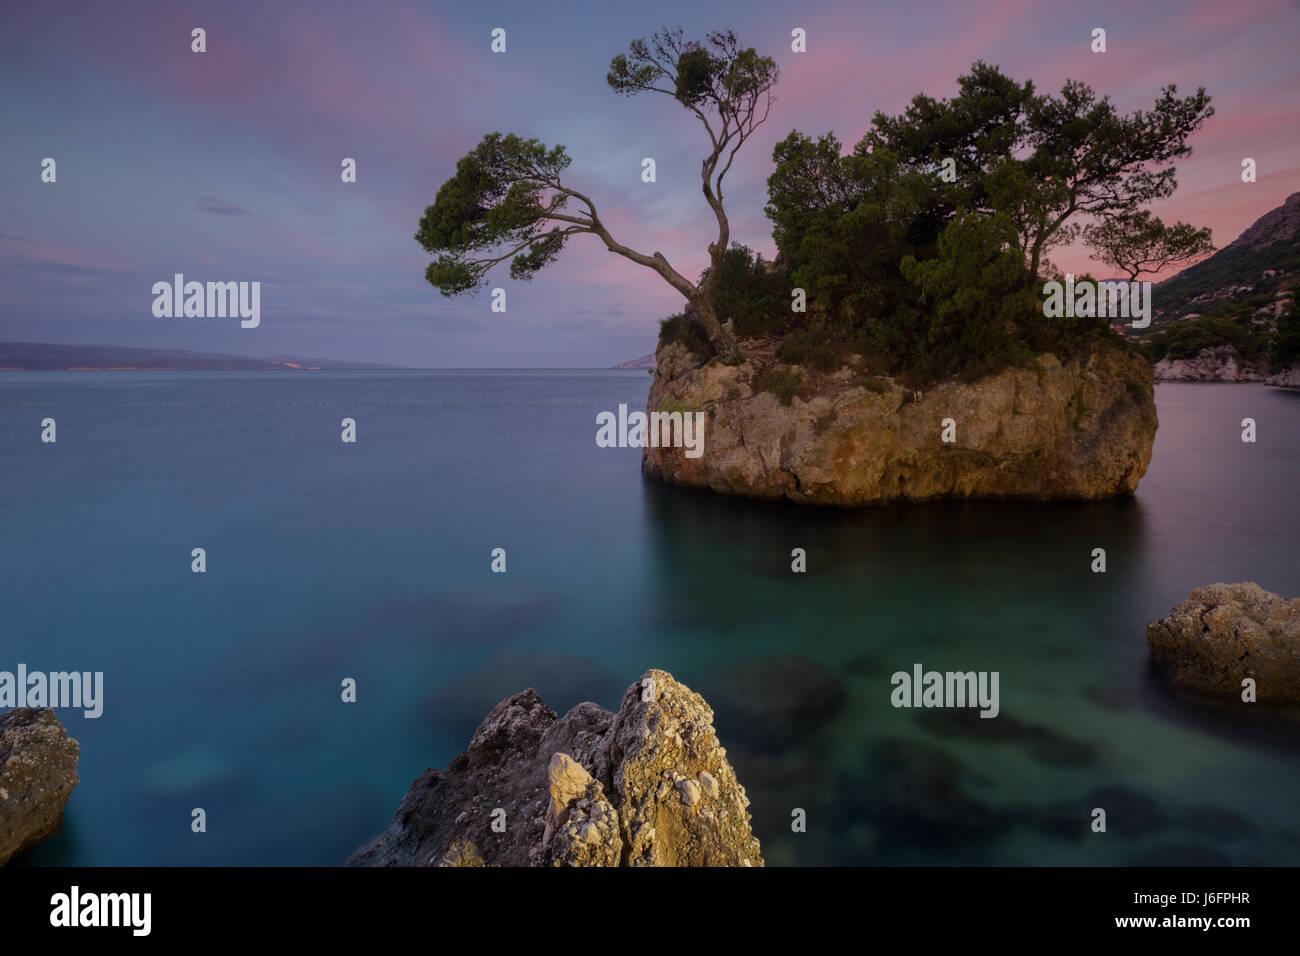 Rock on famous beach in place Brela, Dalmatia, Croatia - Stock Image